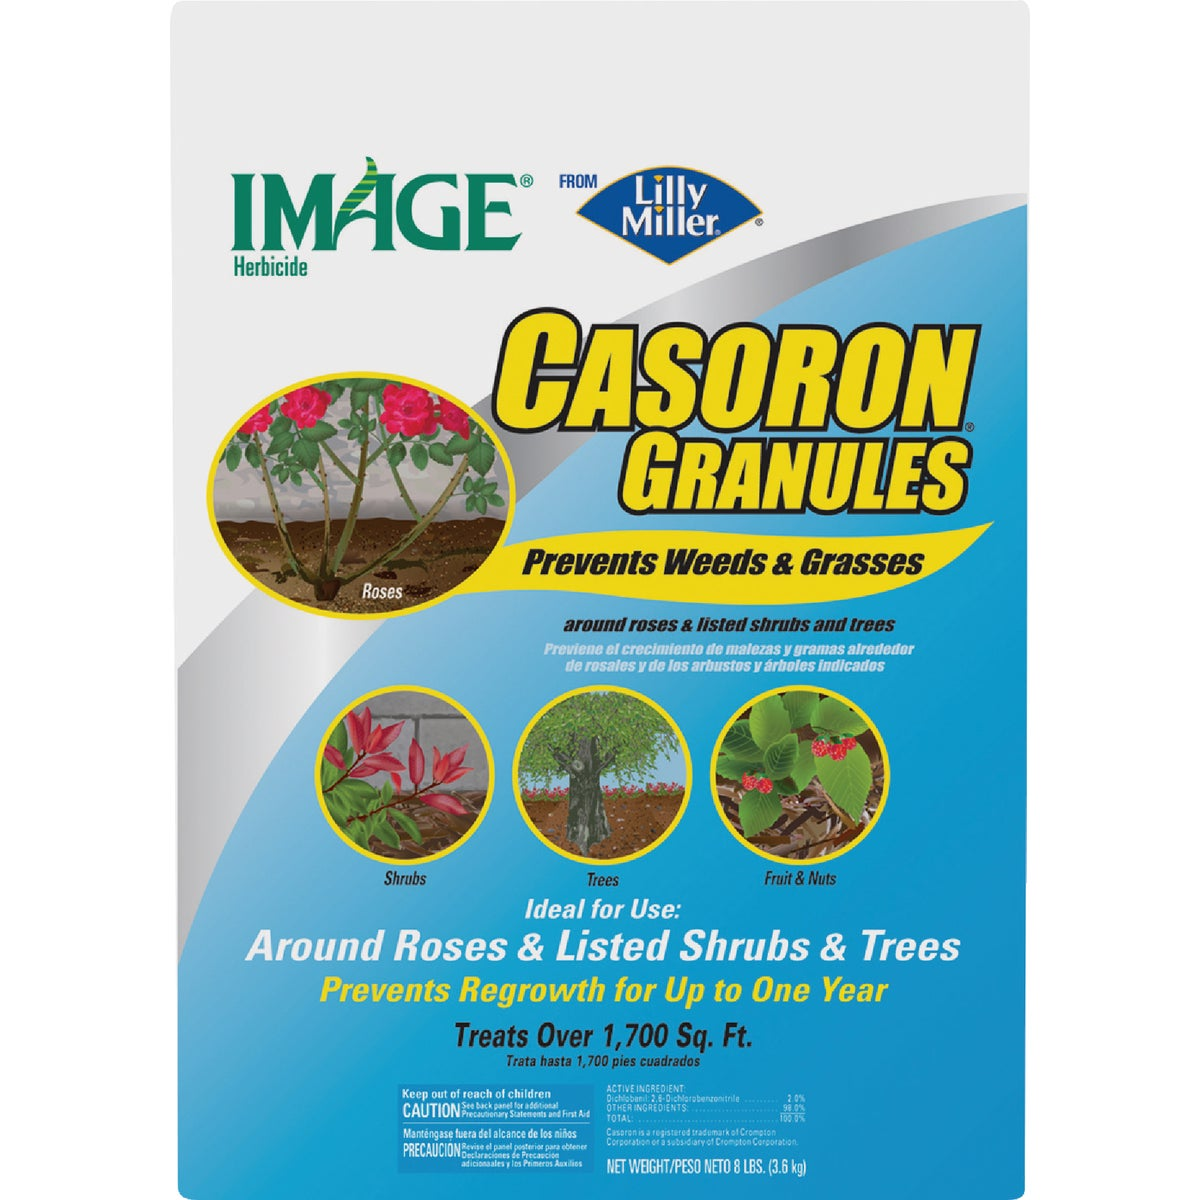 8LB CASORON GRANULES